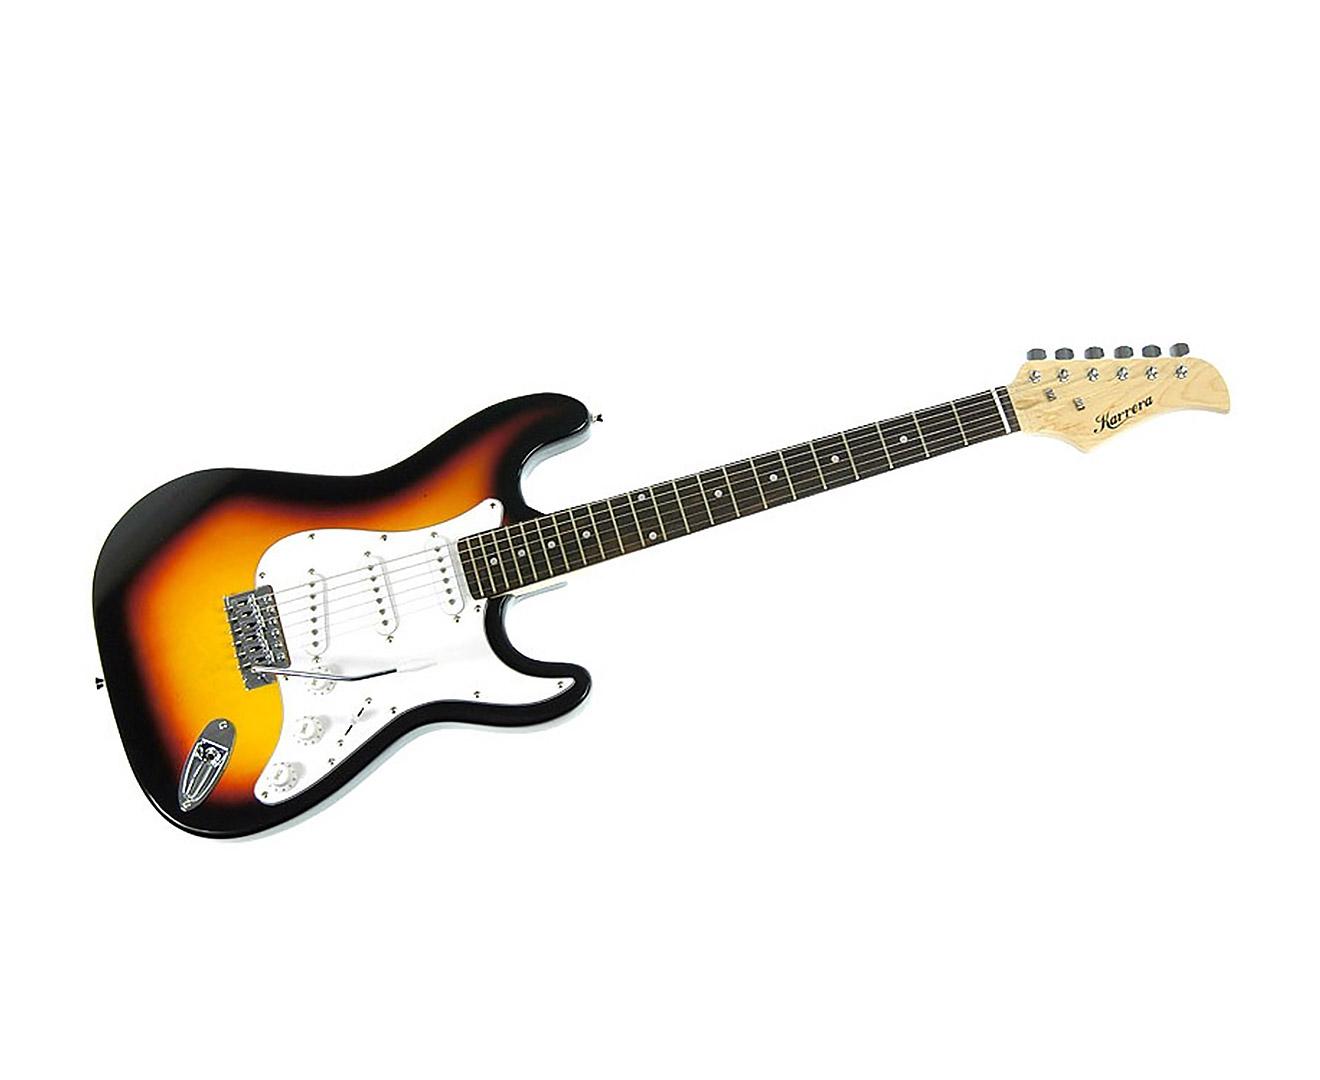 Karrera 39in Electric Guitar - Sunburst